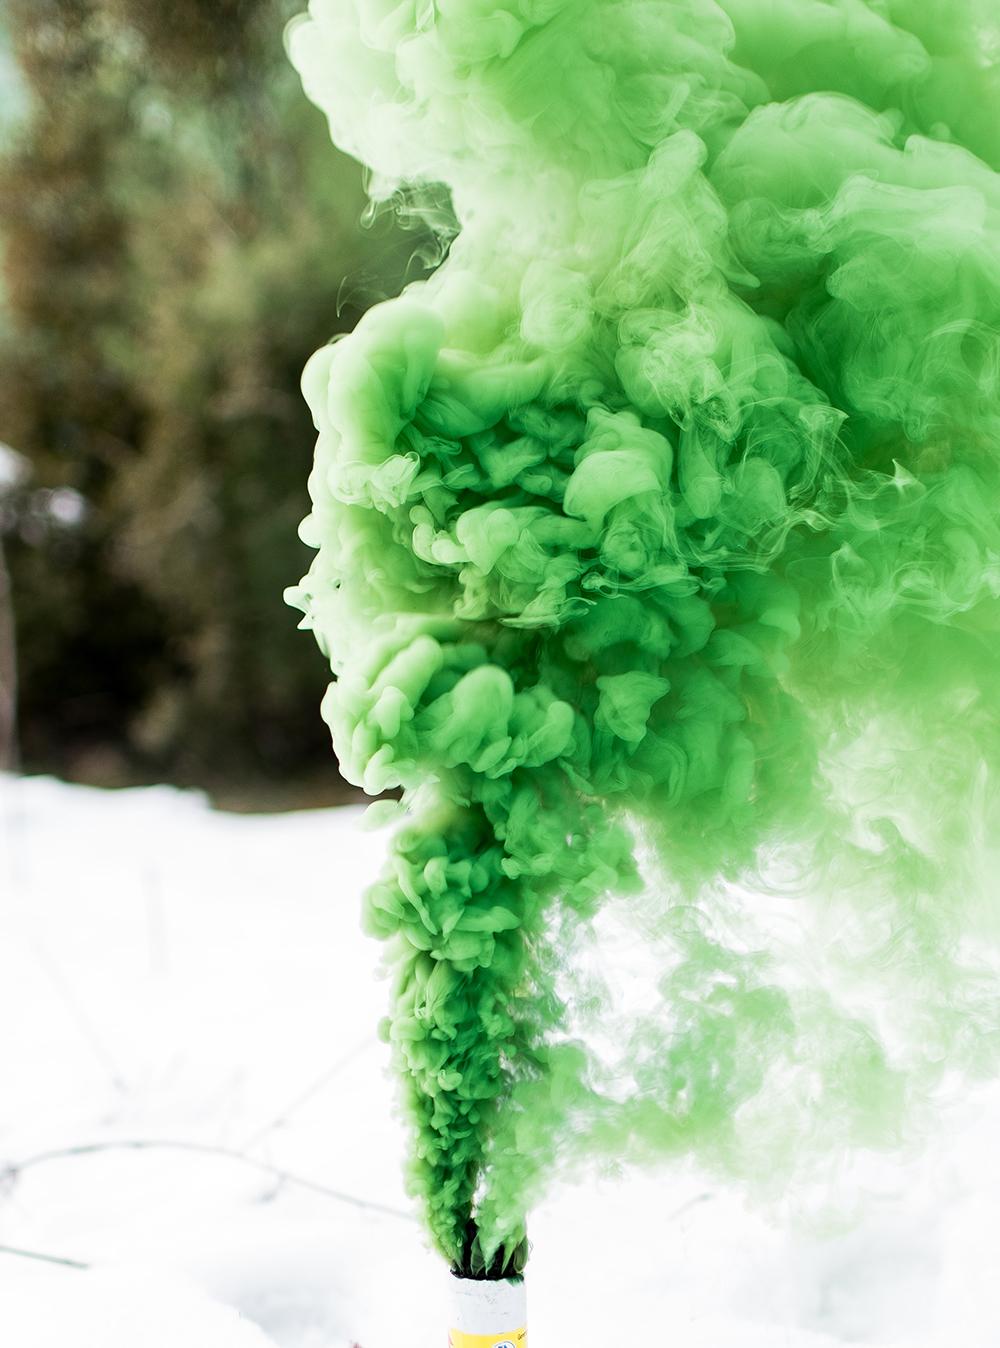 How To Make A Colored Smoke Bomb